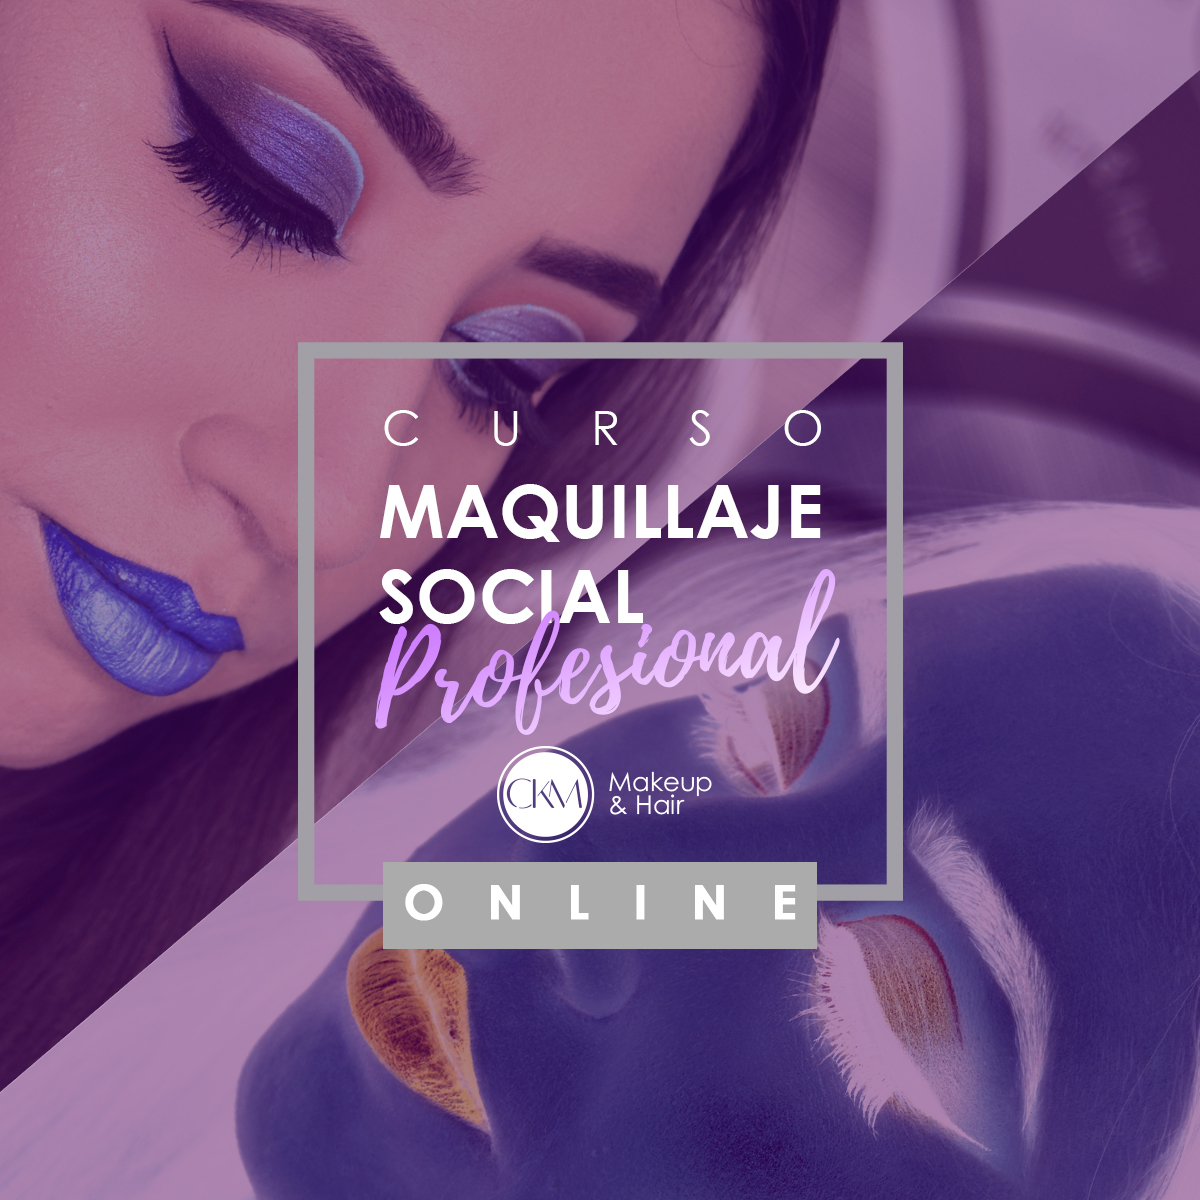 bbaa5c227 Curso de maquillaje social profesional Online En vivo - CKM Makeup